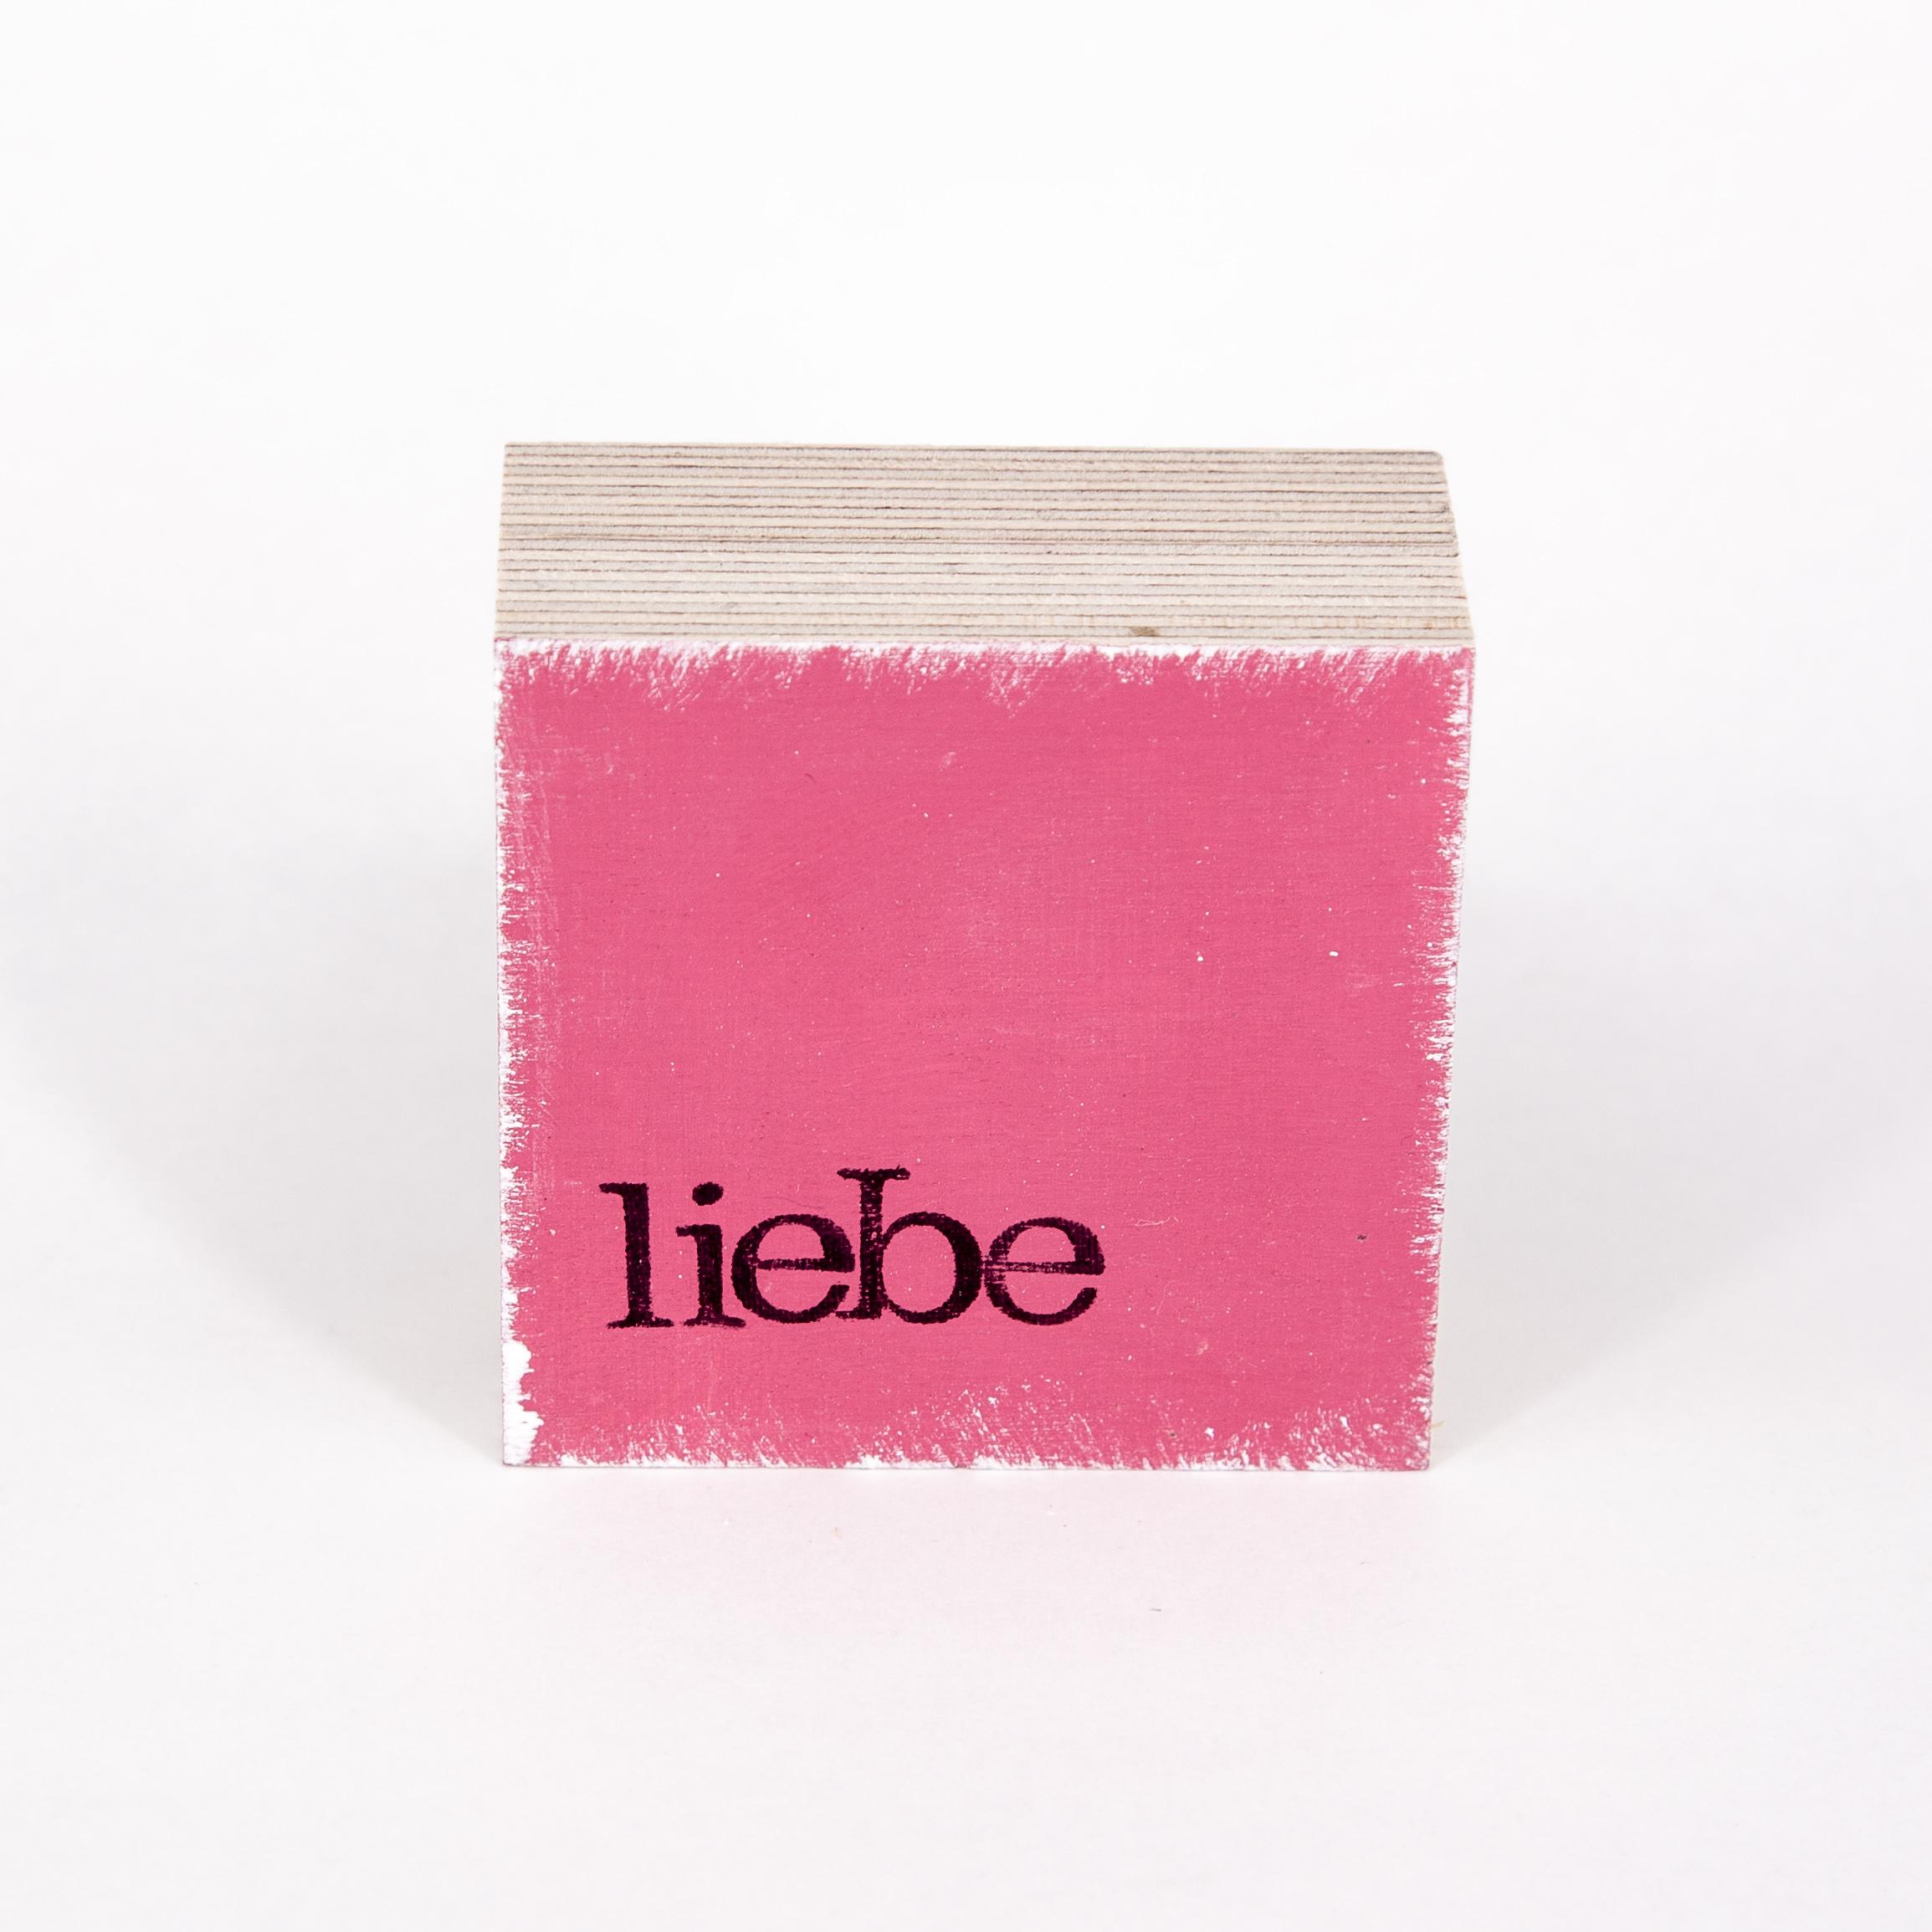 "Mini Textplatte - ""liebe"" - iopla"